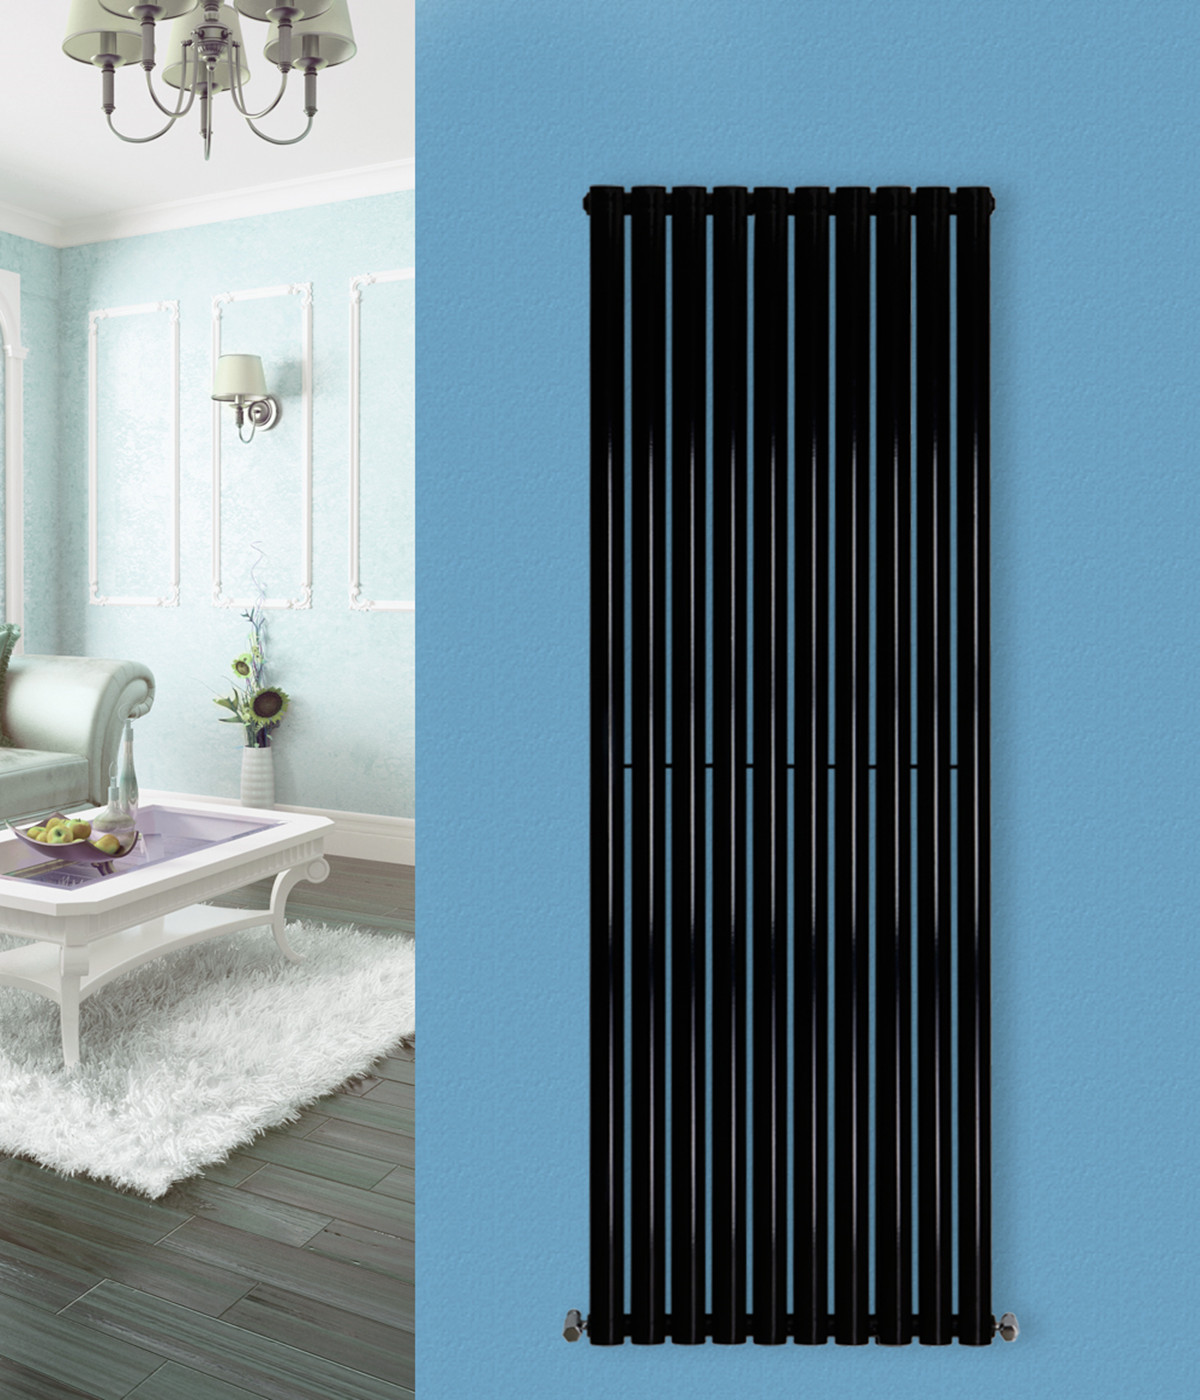 Vertical Oval Panel Tall Upright Column Designer Radiator Central ...